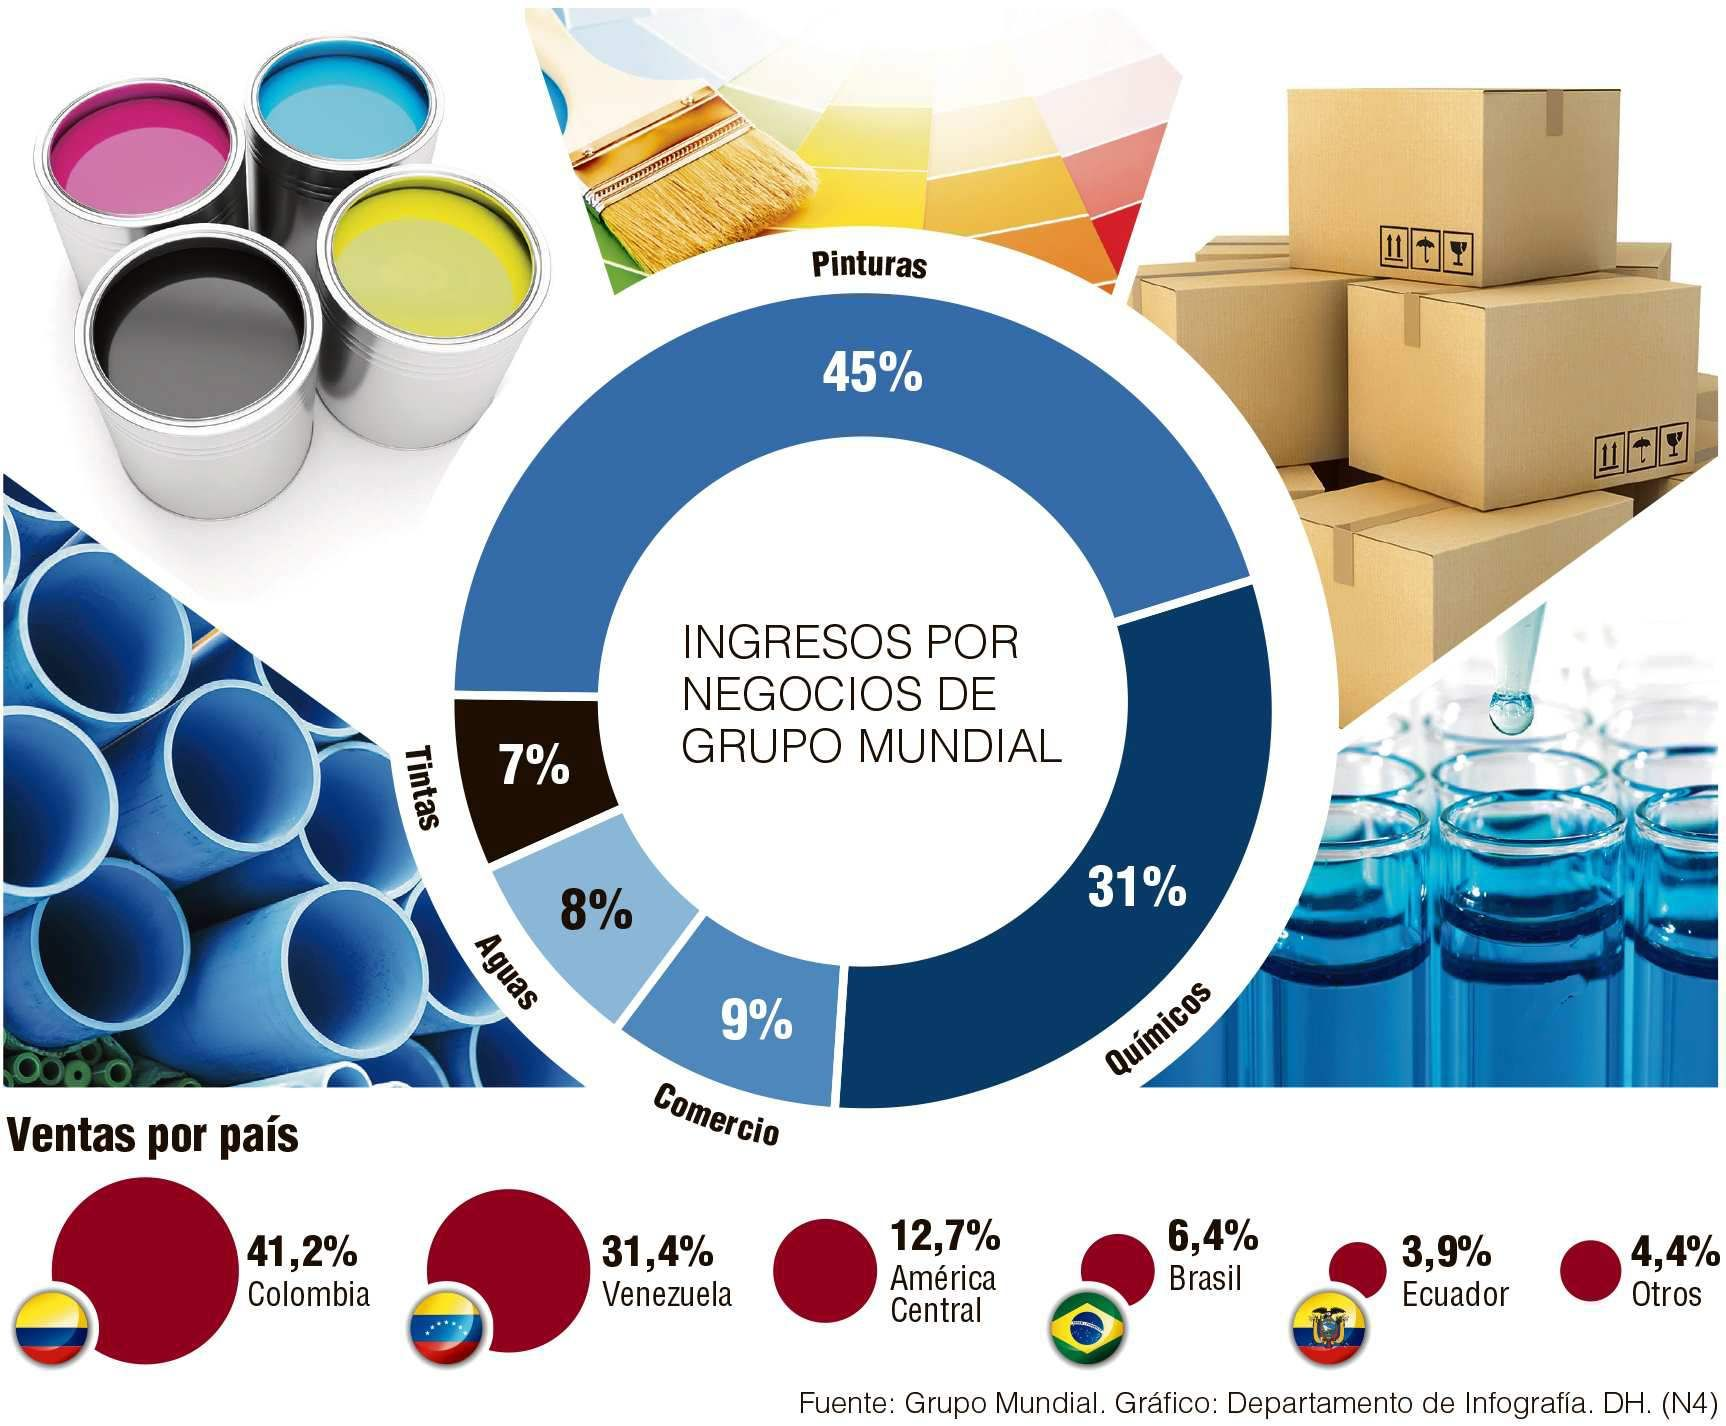 Ingresos por #Negocios de #GrupoMundial vía @Perfil Colombiano